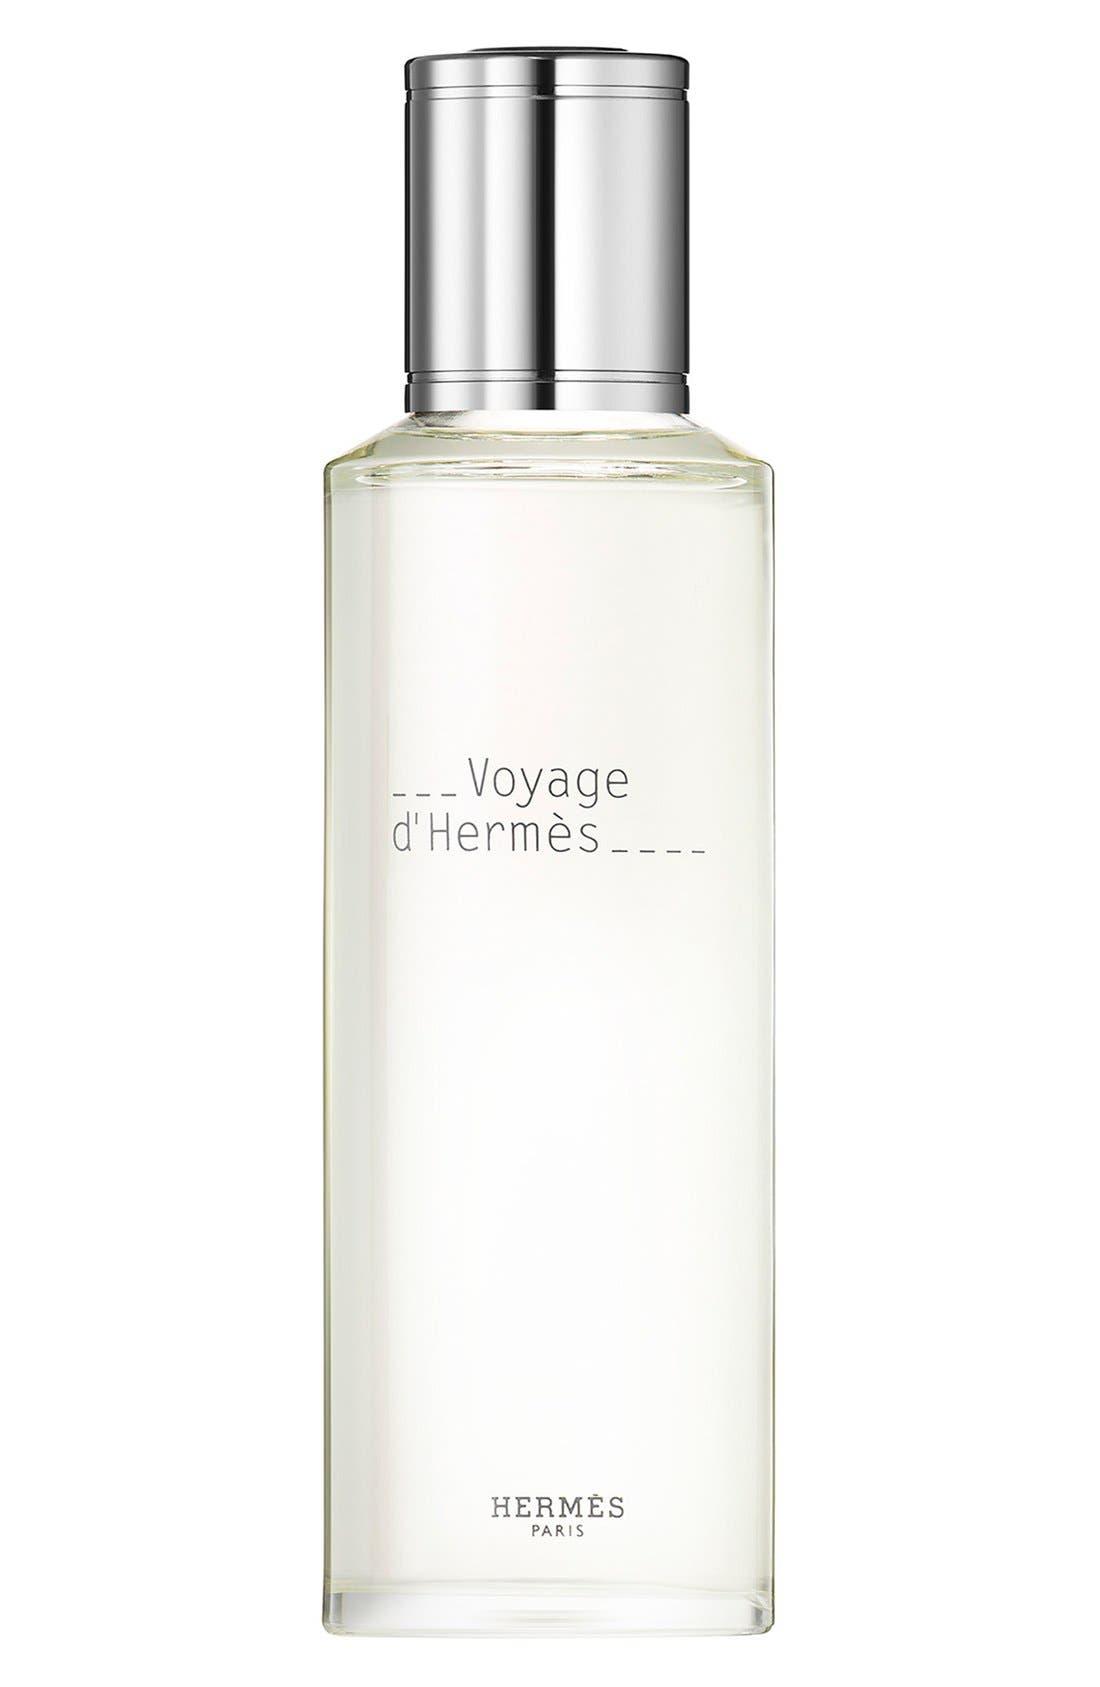 Hermès Voyage d'Hermès - Pure perfume refill,                             Main thumbnail 1, color,                             000